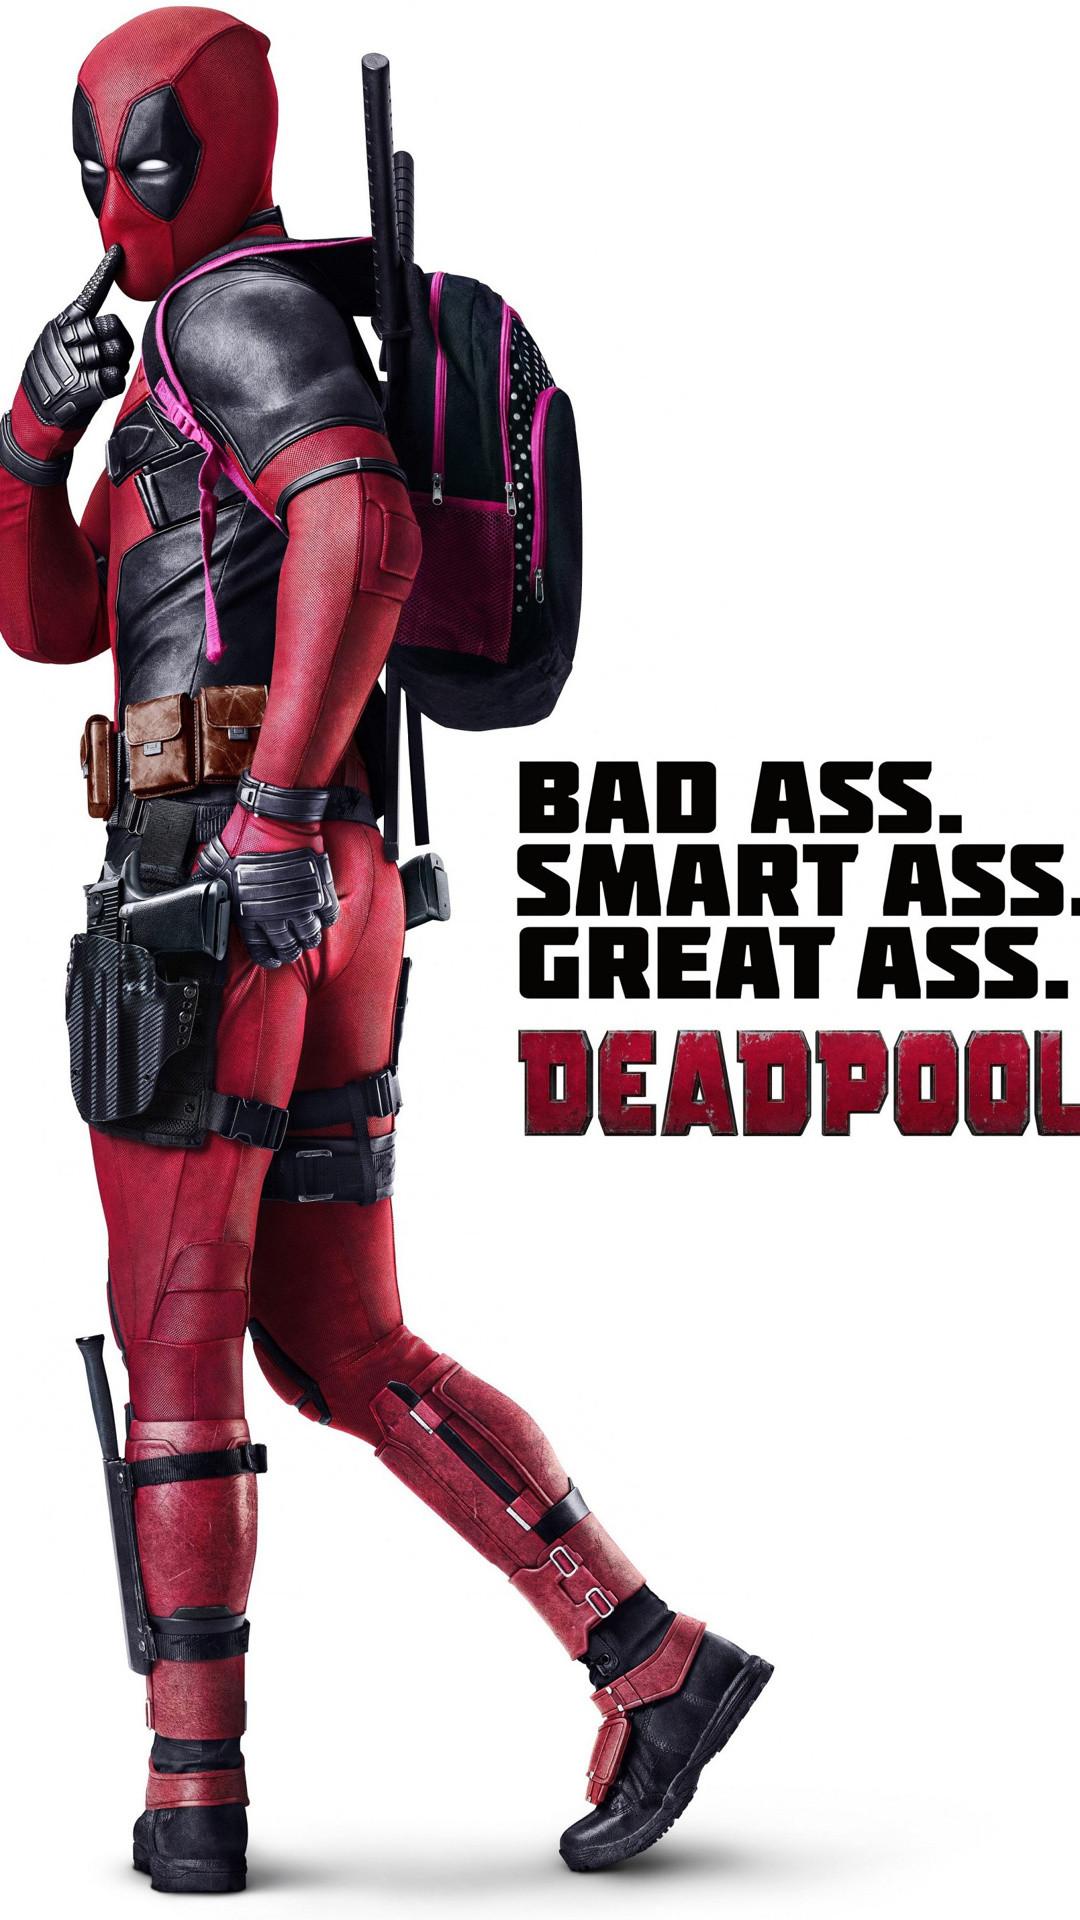 Deadpool The Movie Iphone 6 Plus Wallpaper Data Src Funny Deadpool Wallpaper Iphone 1080x1920 Wallpaper Teahub Io